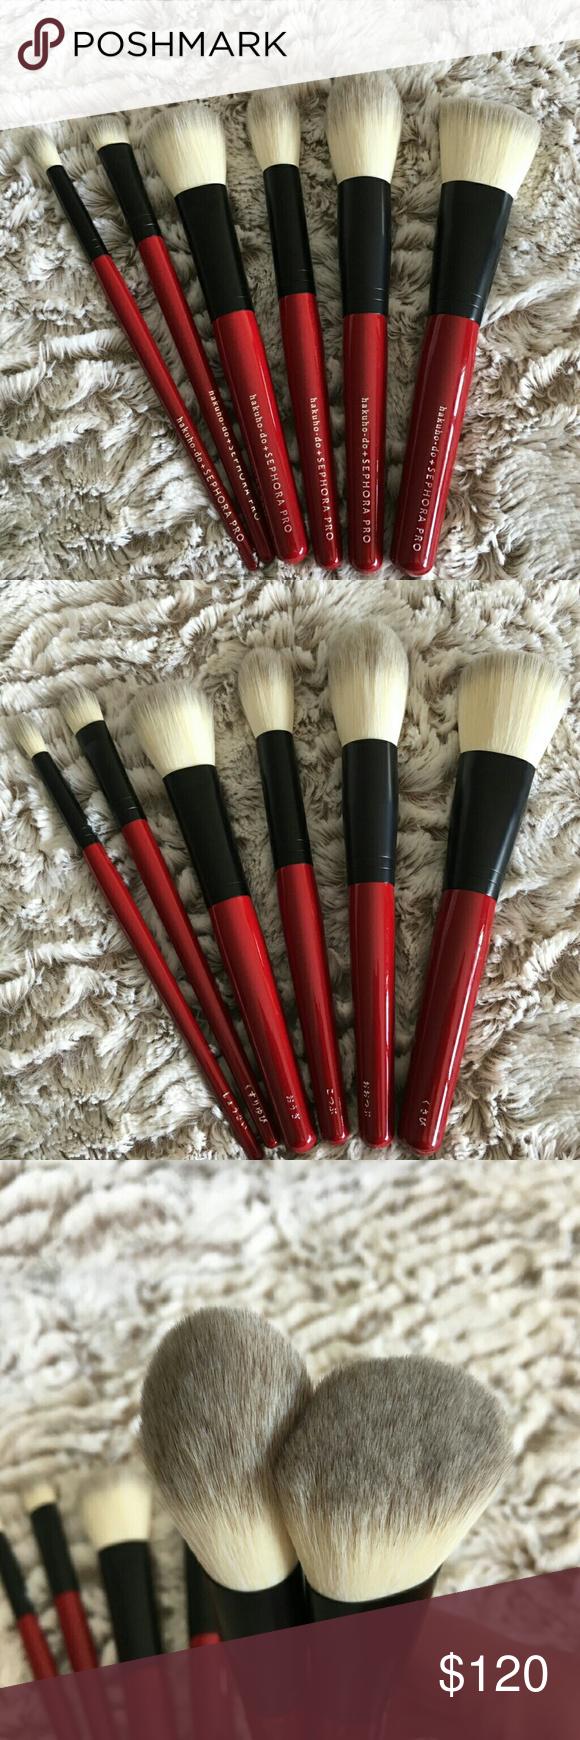 Hakuhodo sephora 6 brushes set nwt Sephora makeup